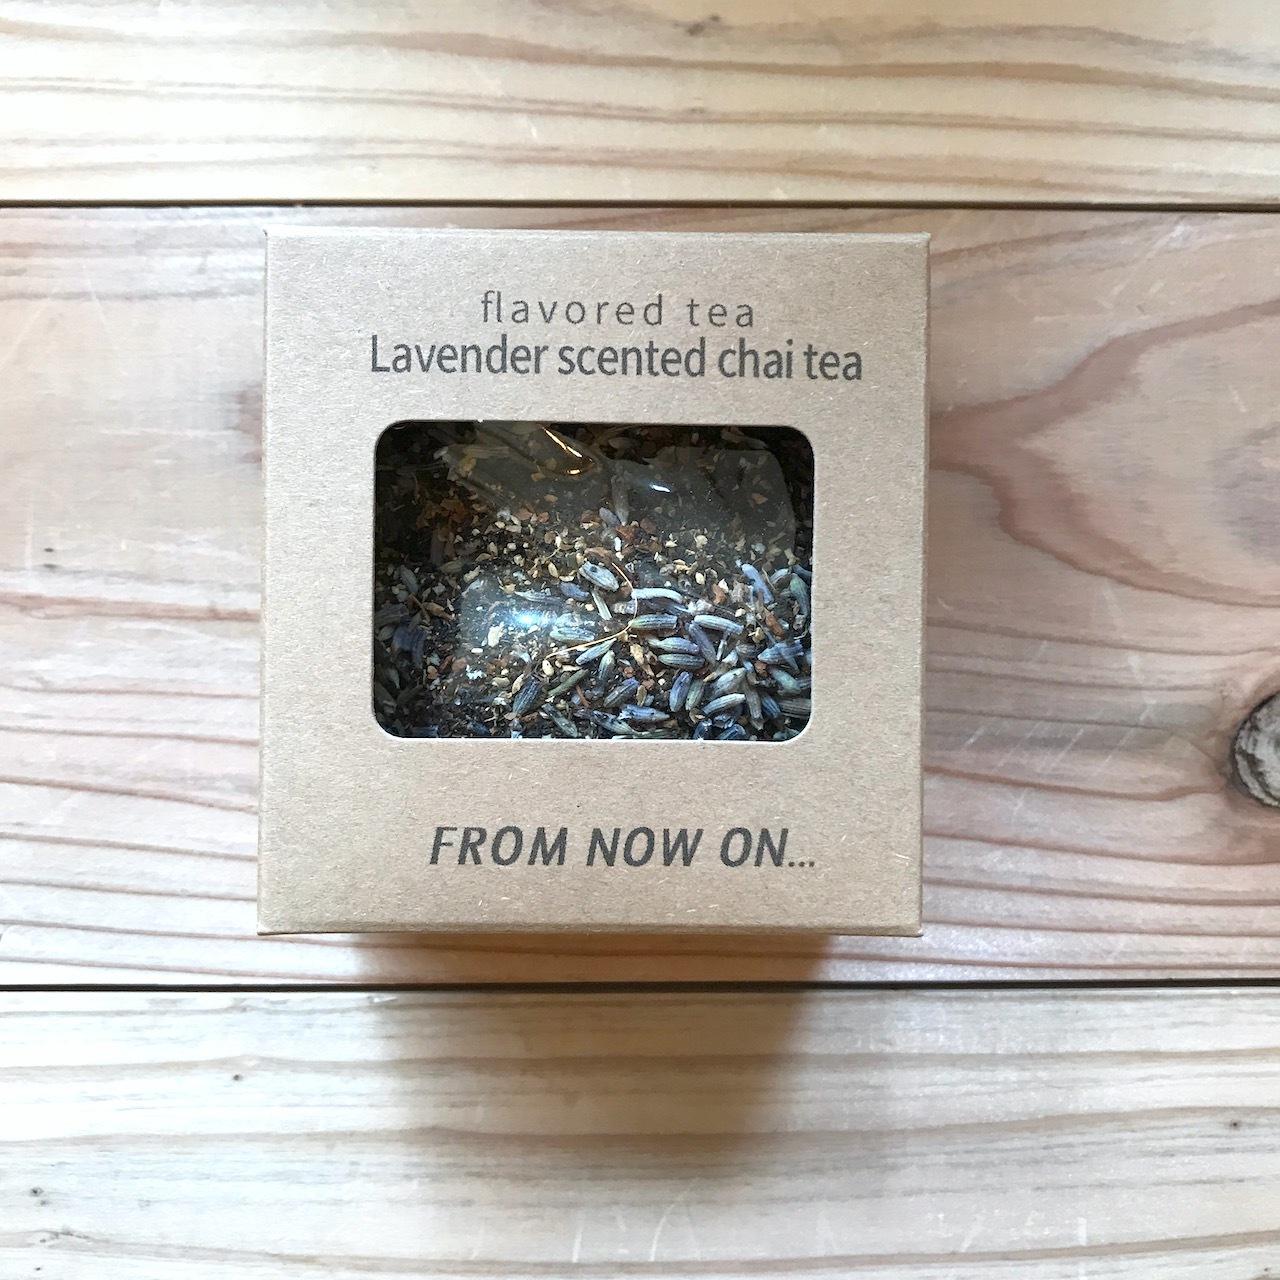 """ FNO Lavender scented chai tea / ラベンダーチャイティー カートンS 20g """